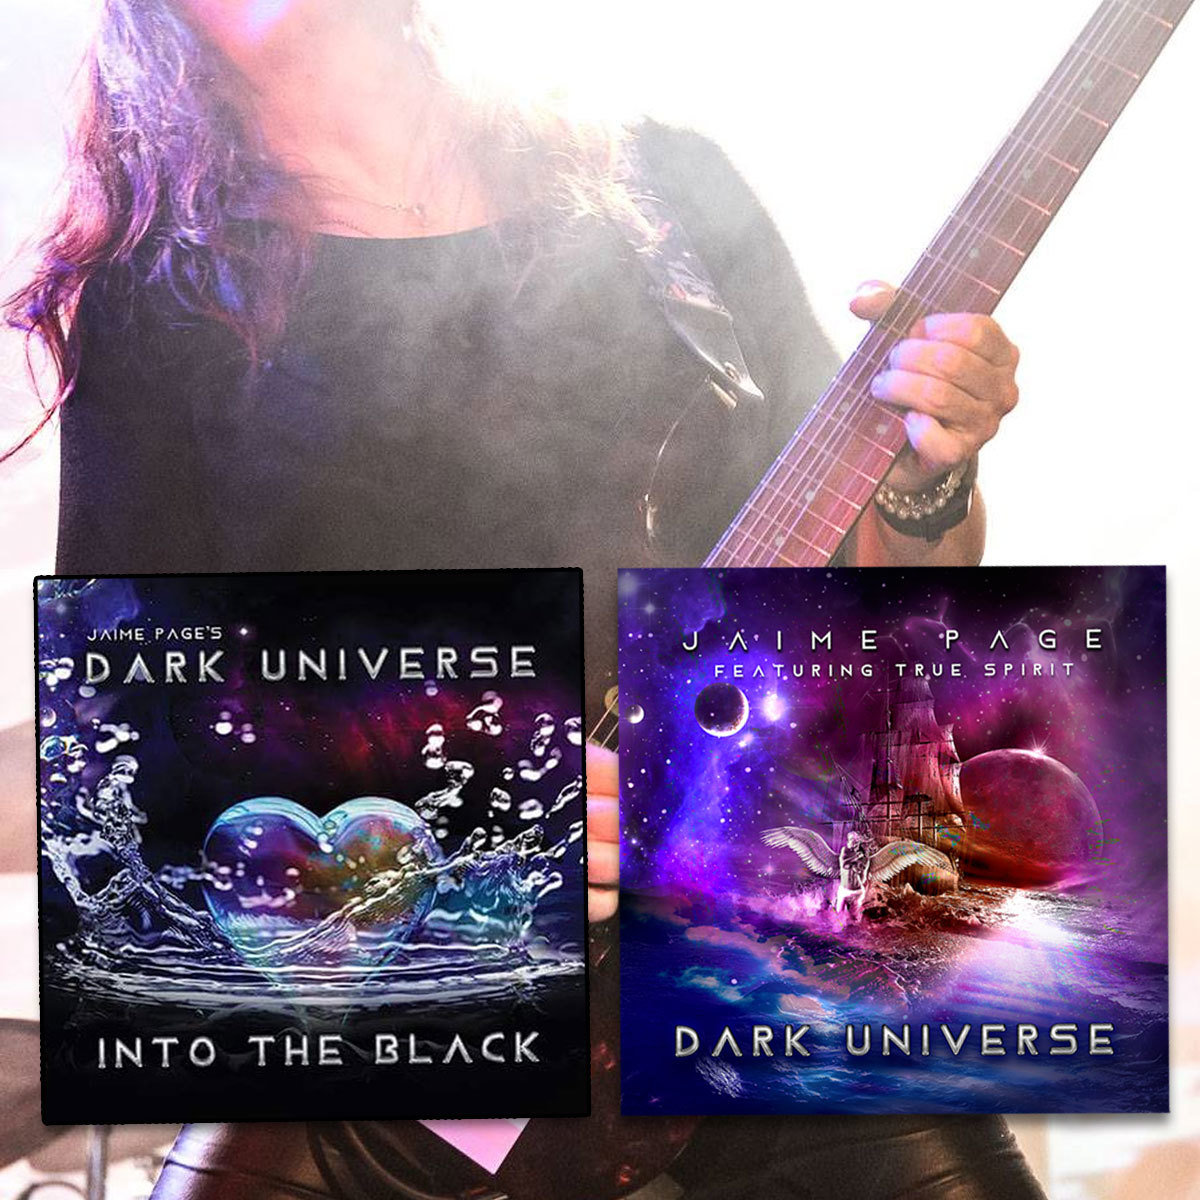 Dark Universe CD Bundle - Get Both!